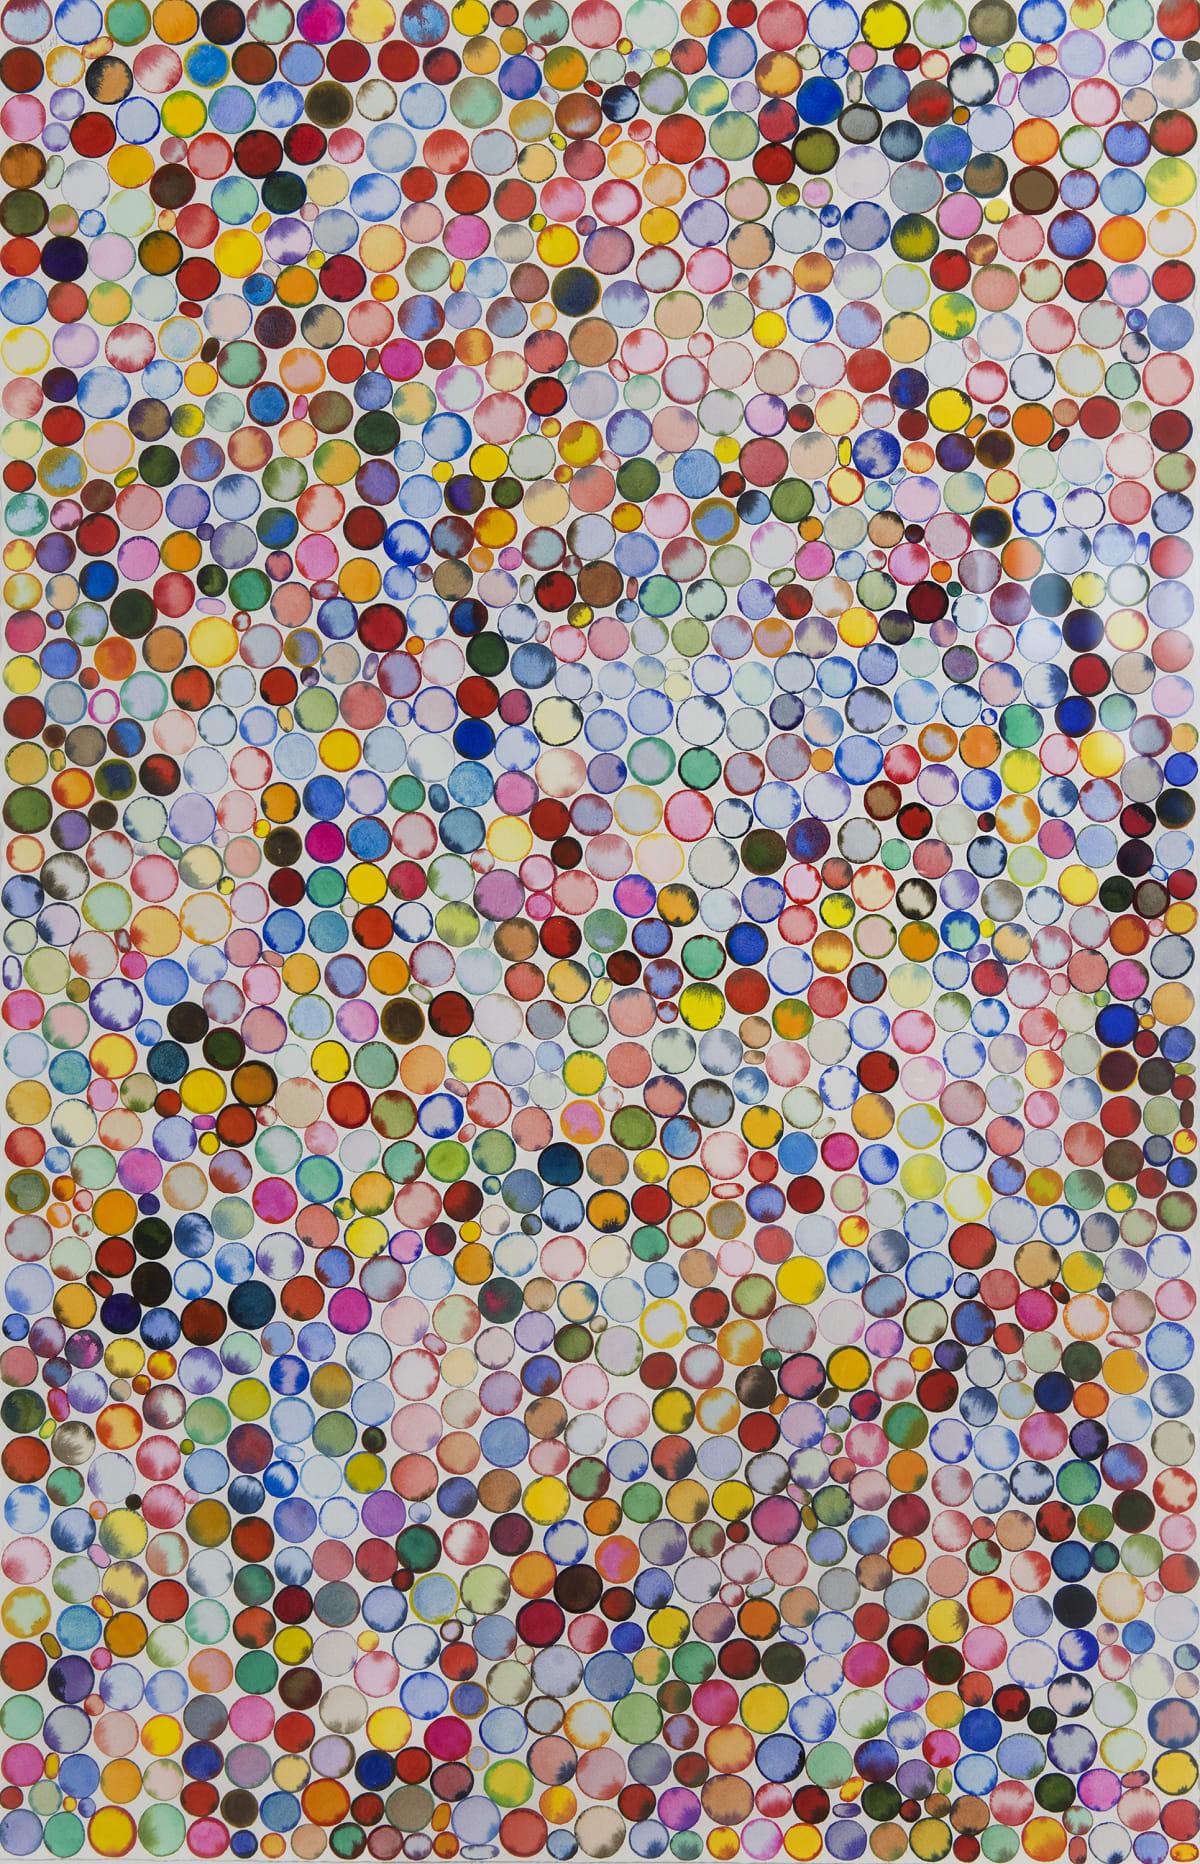 "Deborah Friedman Diversity I Watercolor on paper 26 x 40"" unframed 32.25 x 46"" framed"